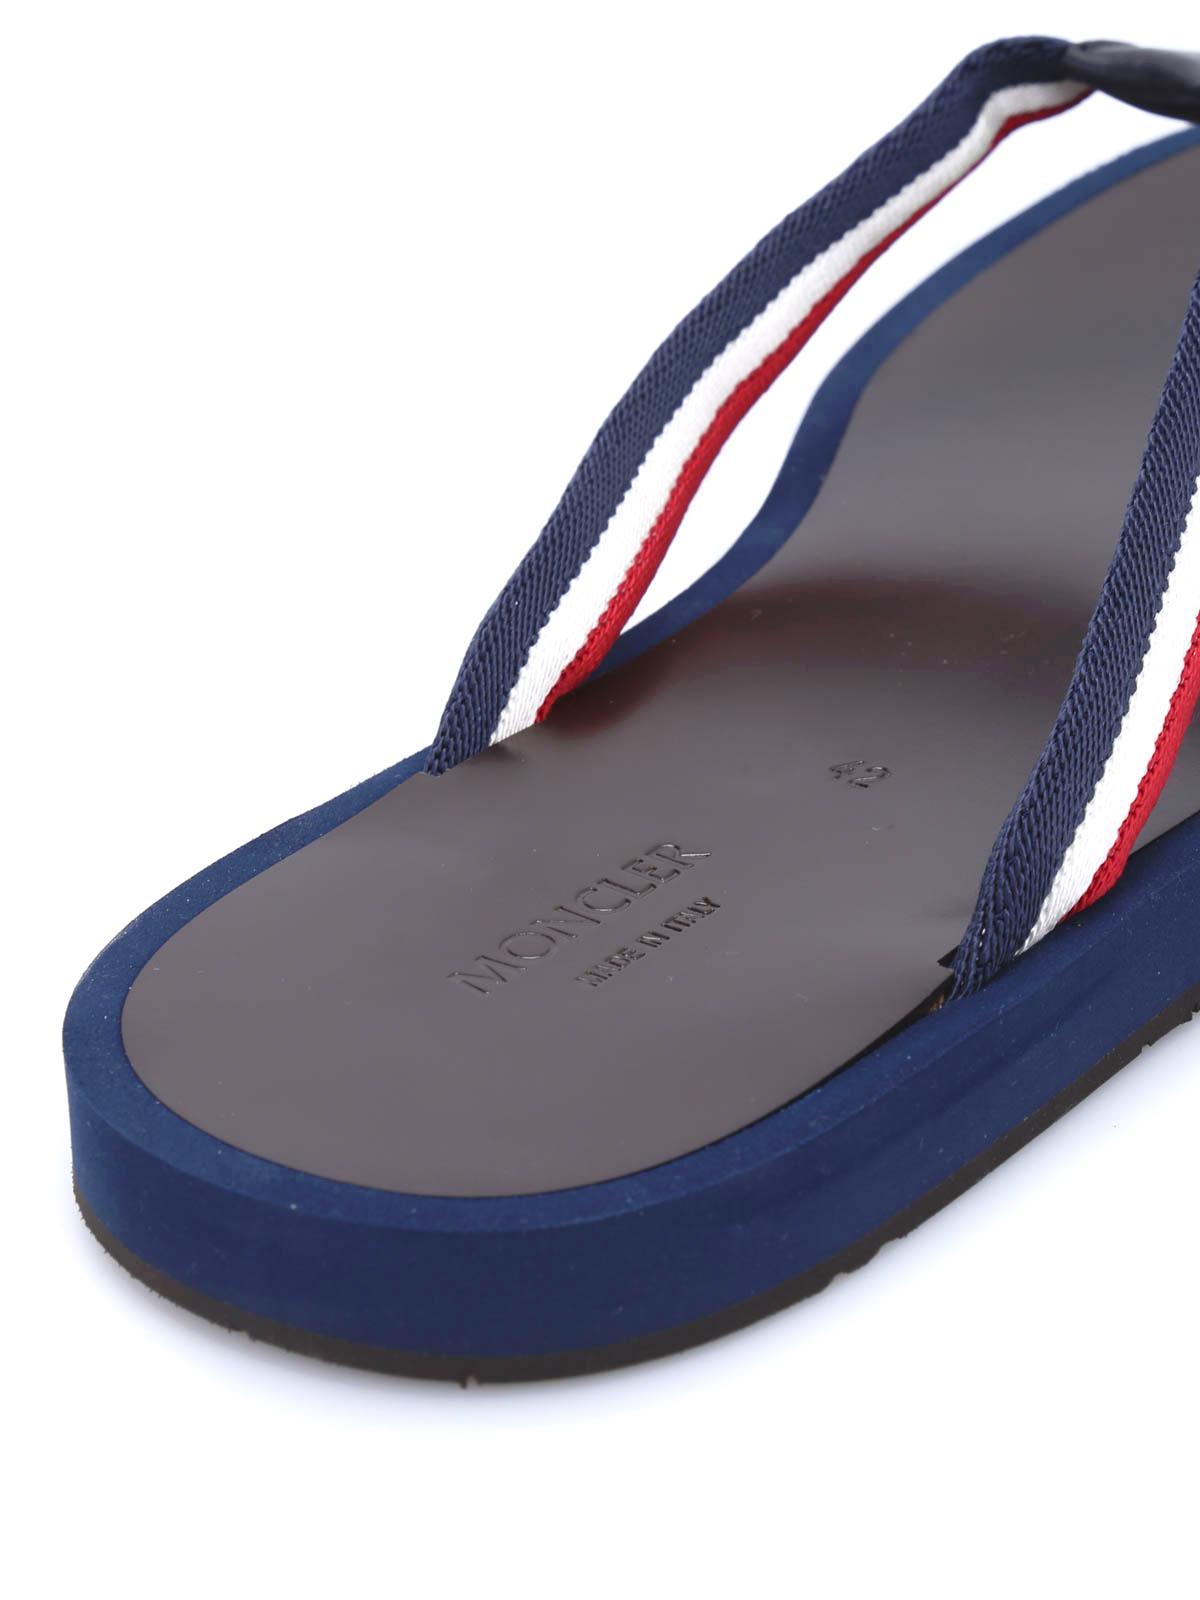 f7933996dd8d Moncler - New Ajaccio flip flops - flip flops - 1013500 07951 743